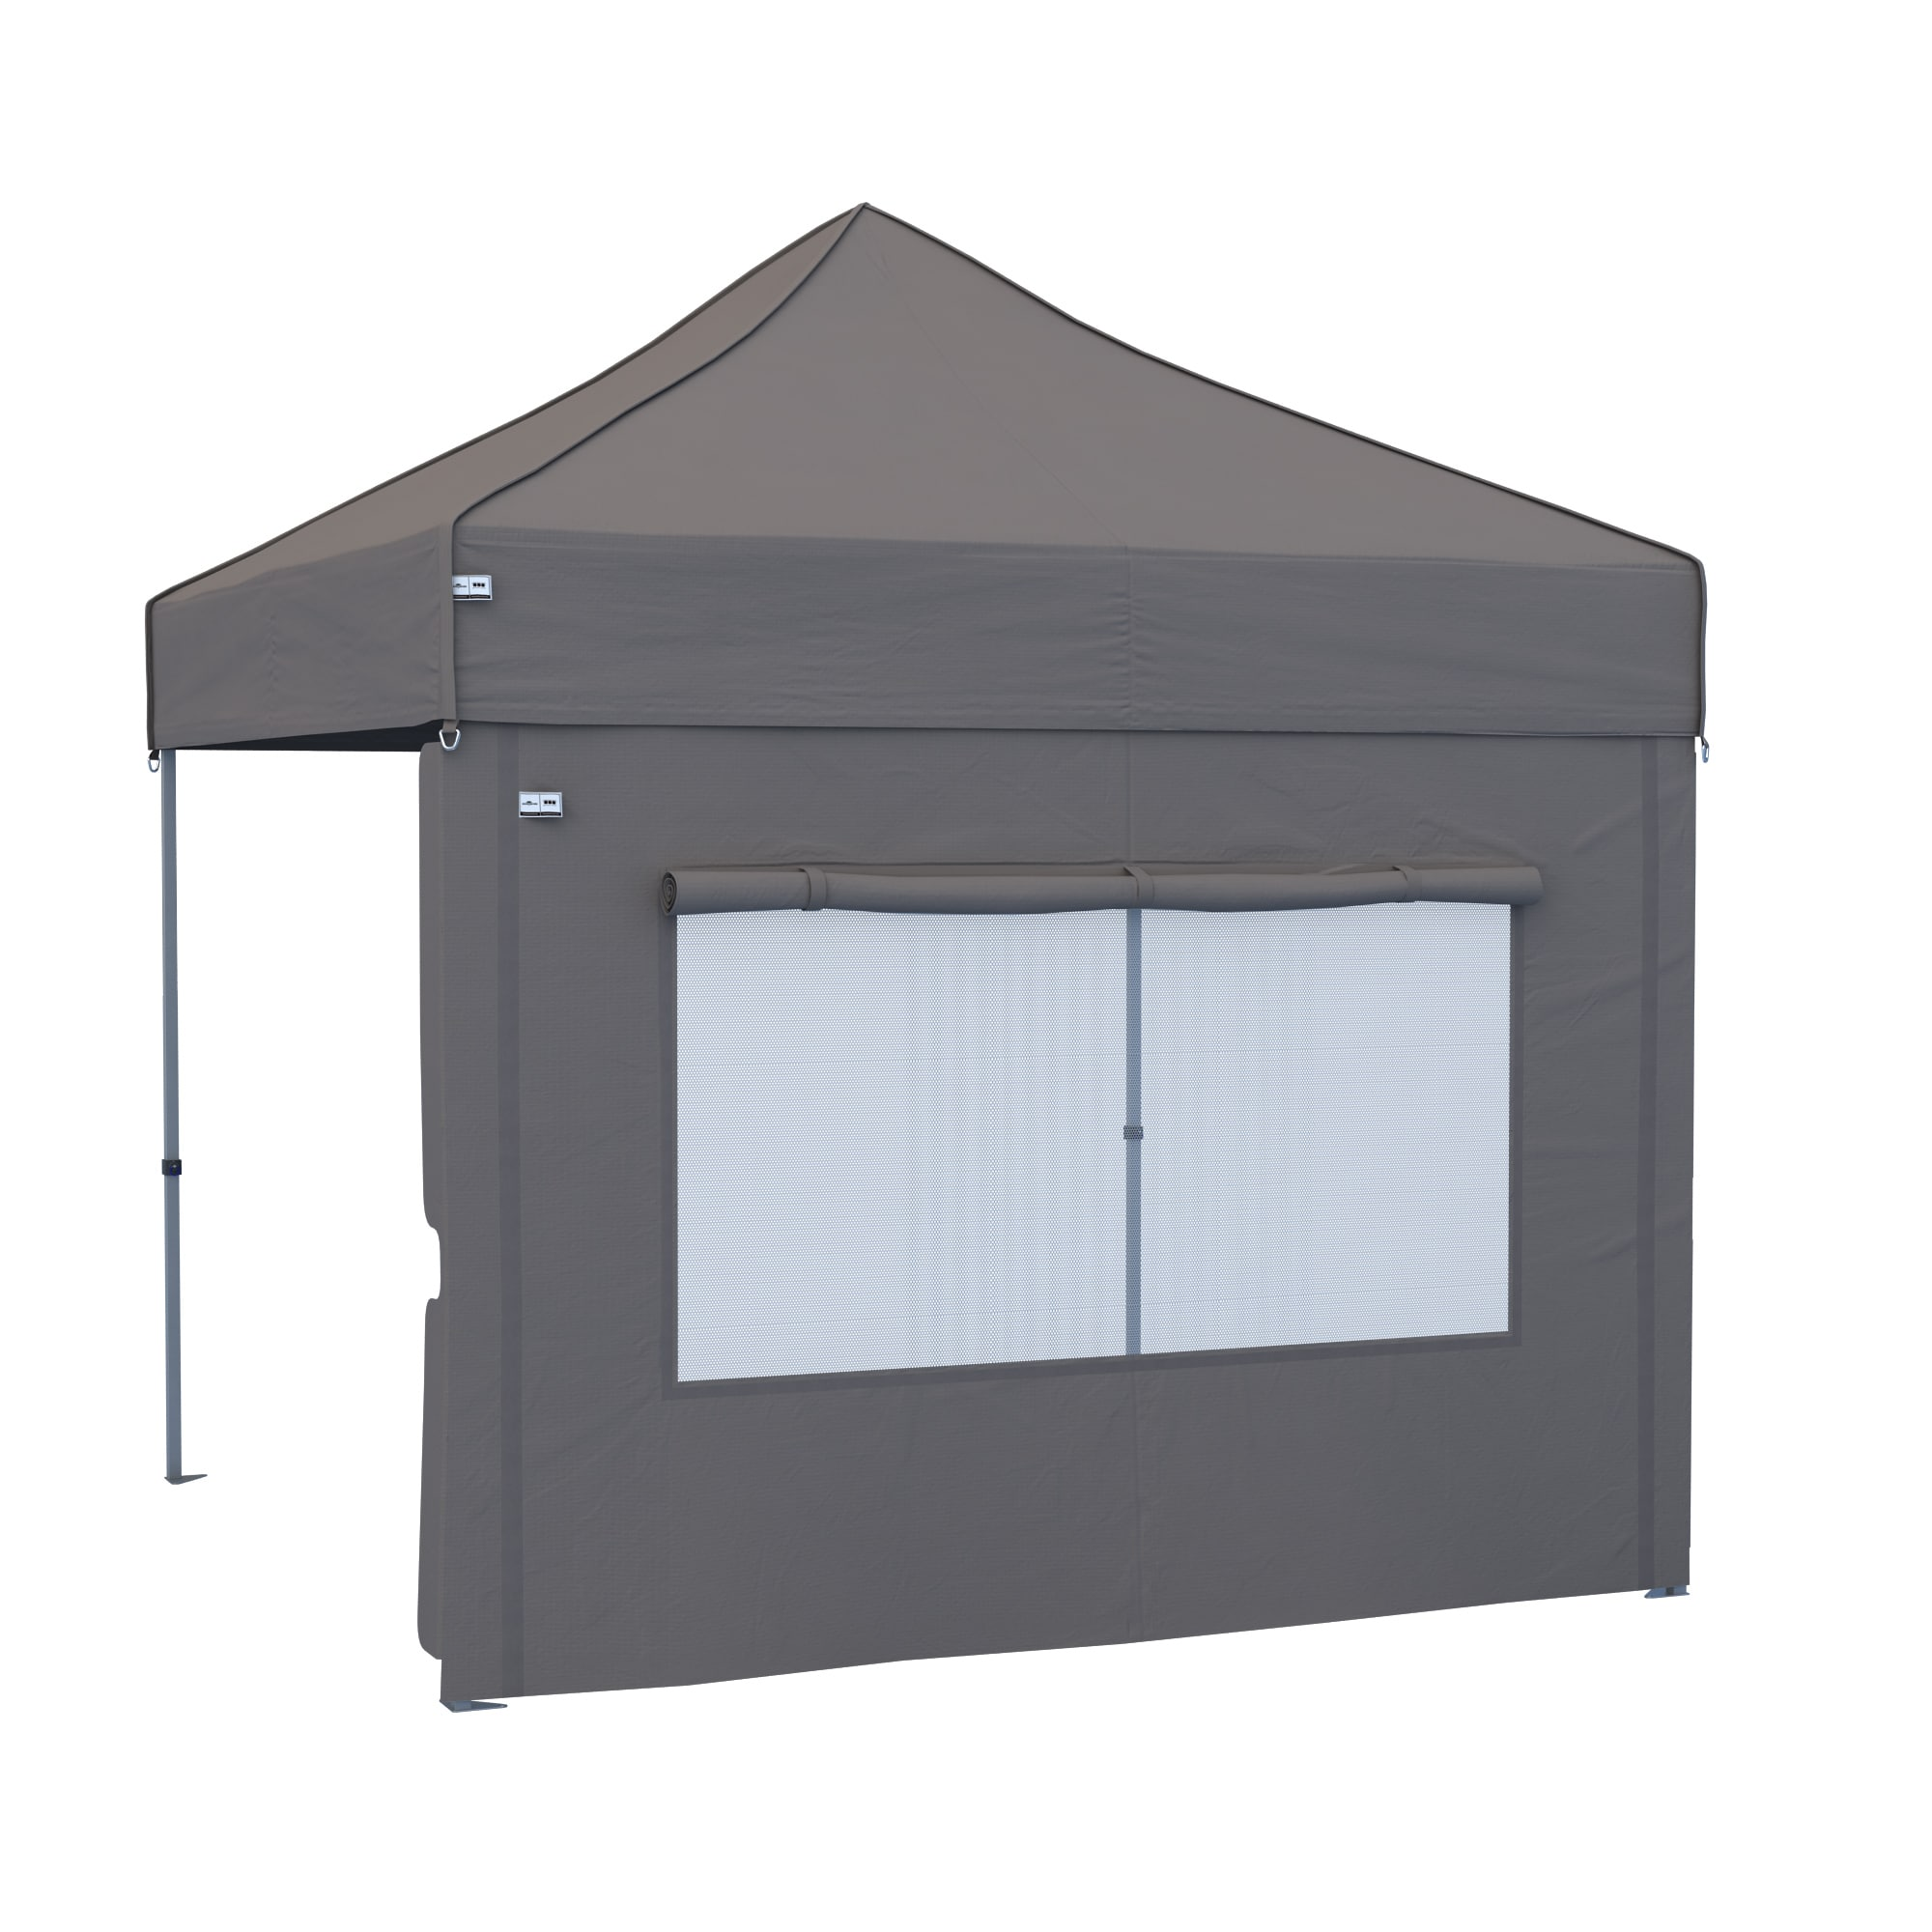 seitenwand f r pavillon gartenzelt t r fenster moskitonetz seitenteil pavillon ebay. Black Bedroom Furniture Sets. Home Design Ideas